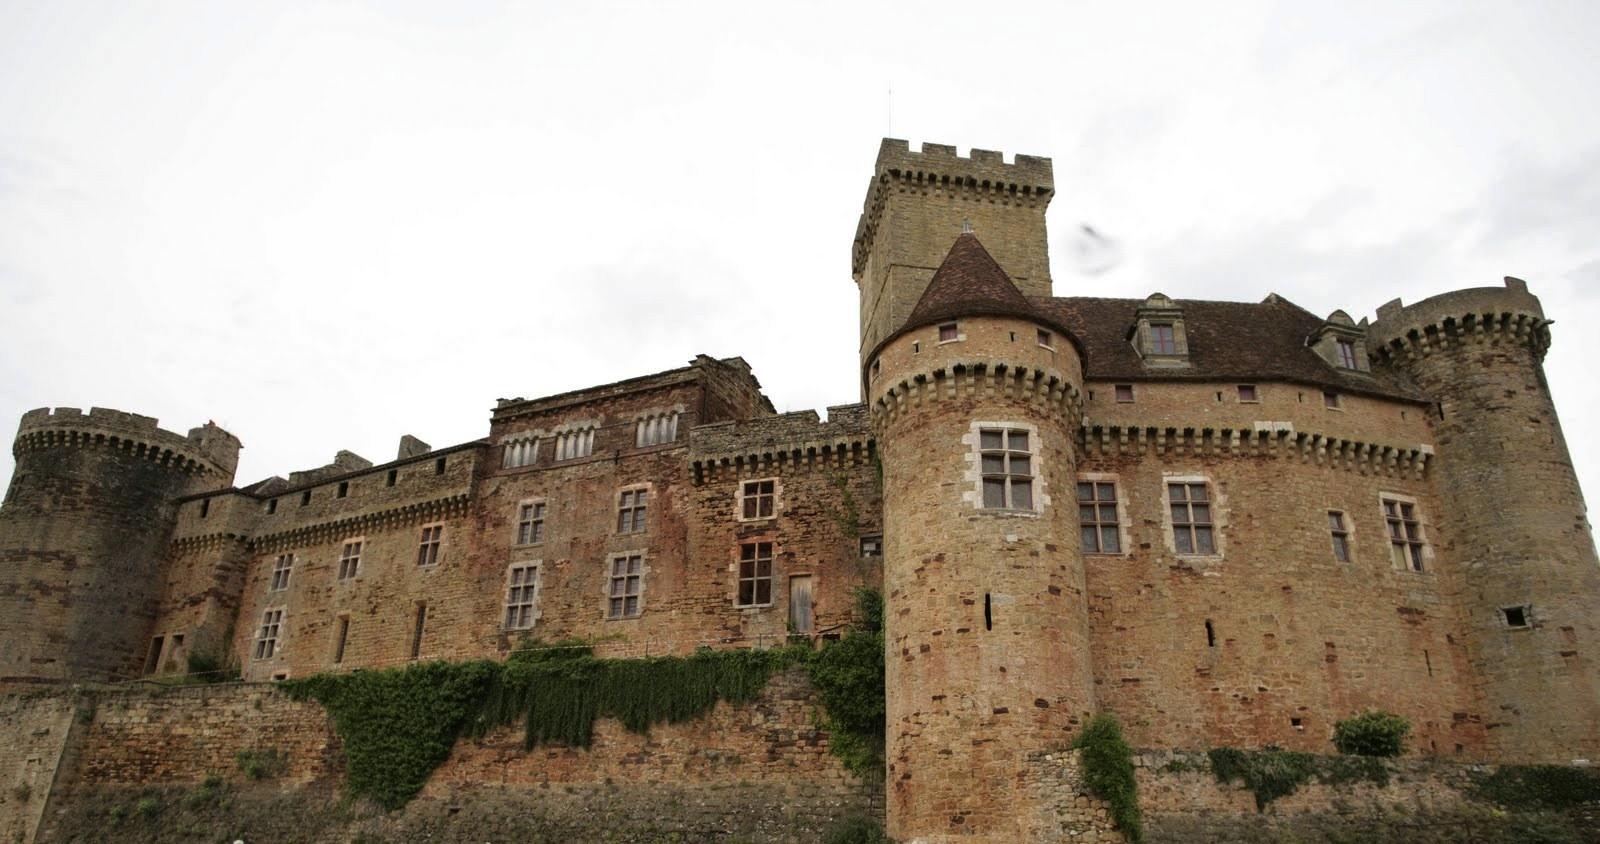 chateau castelnau bretonou, quercy